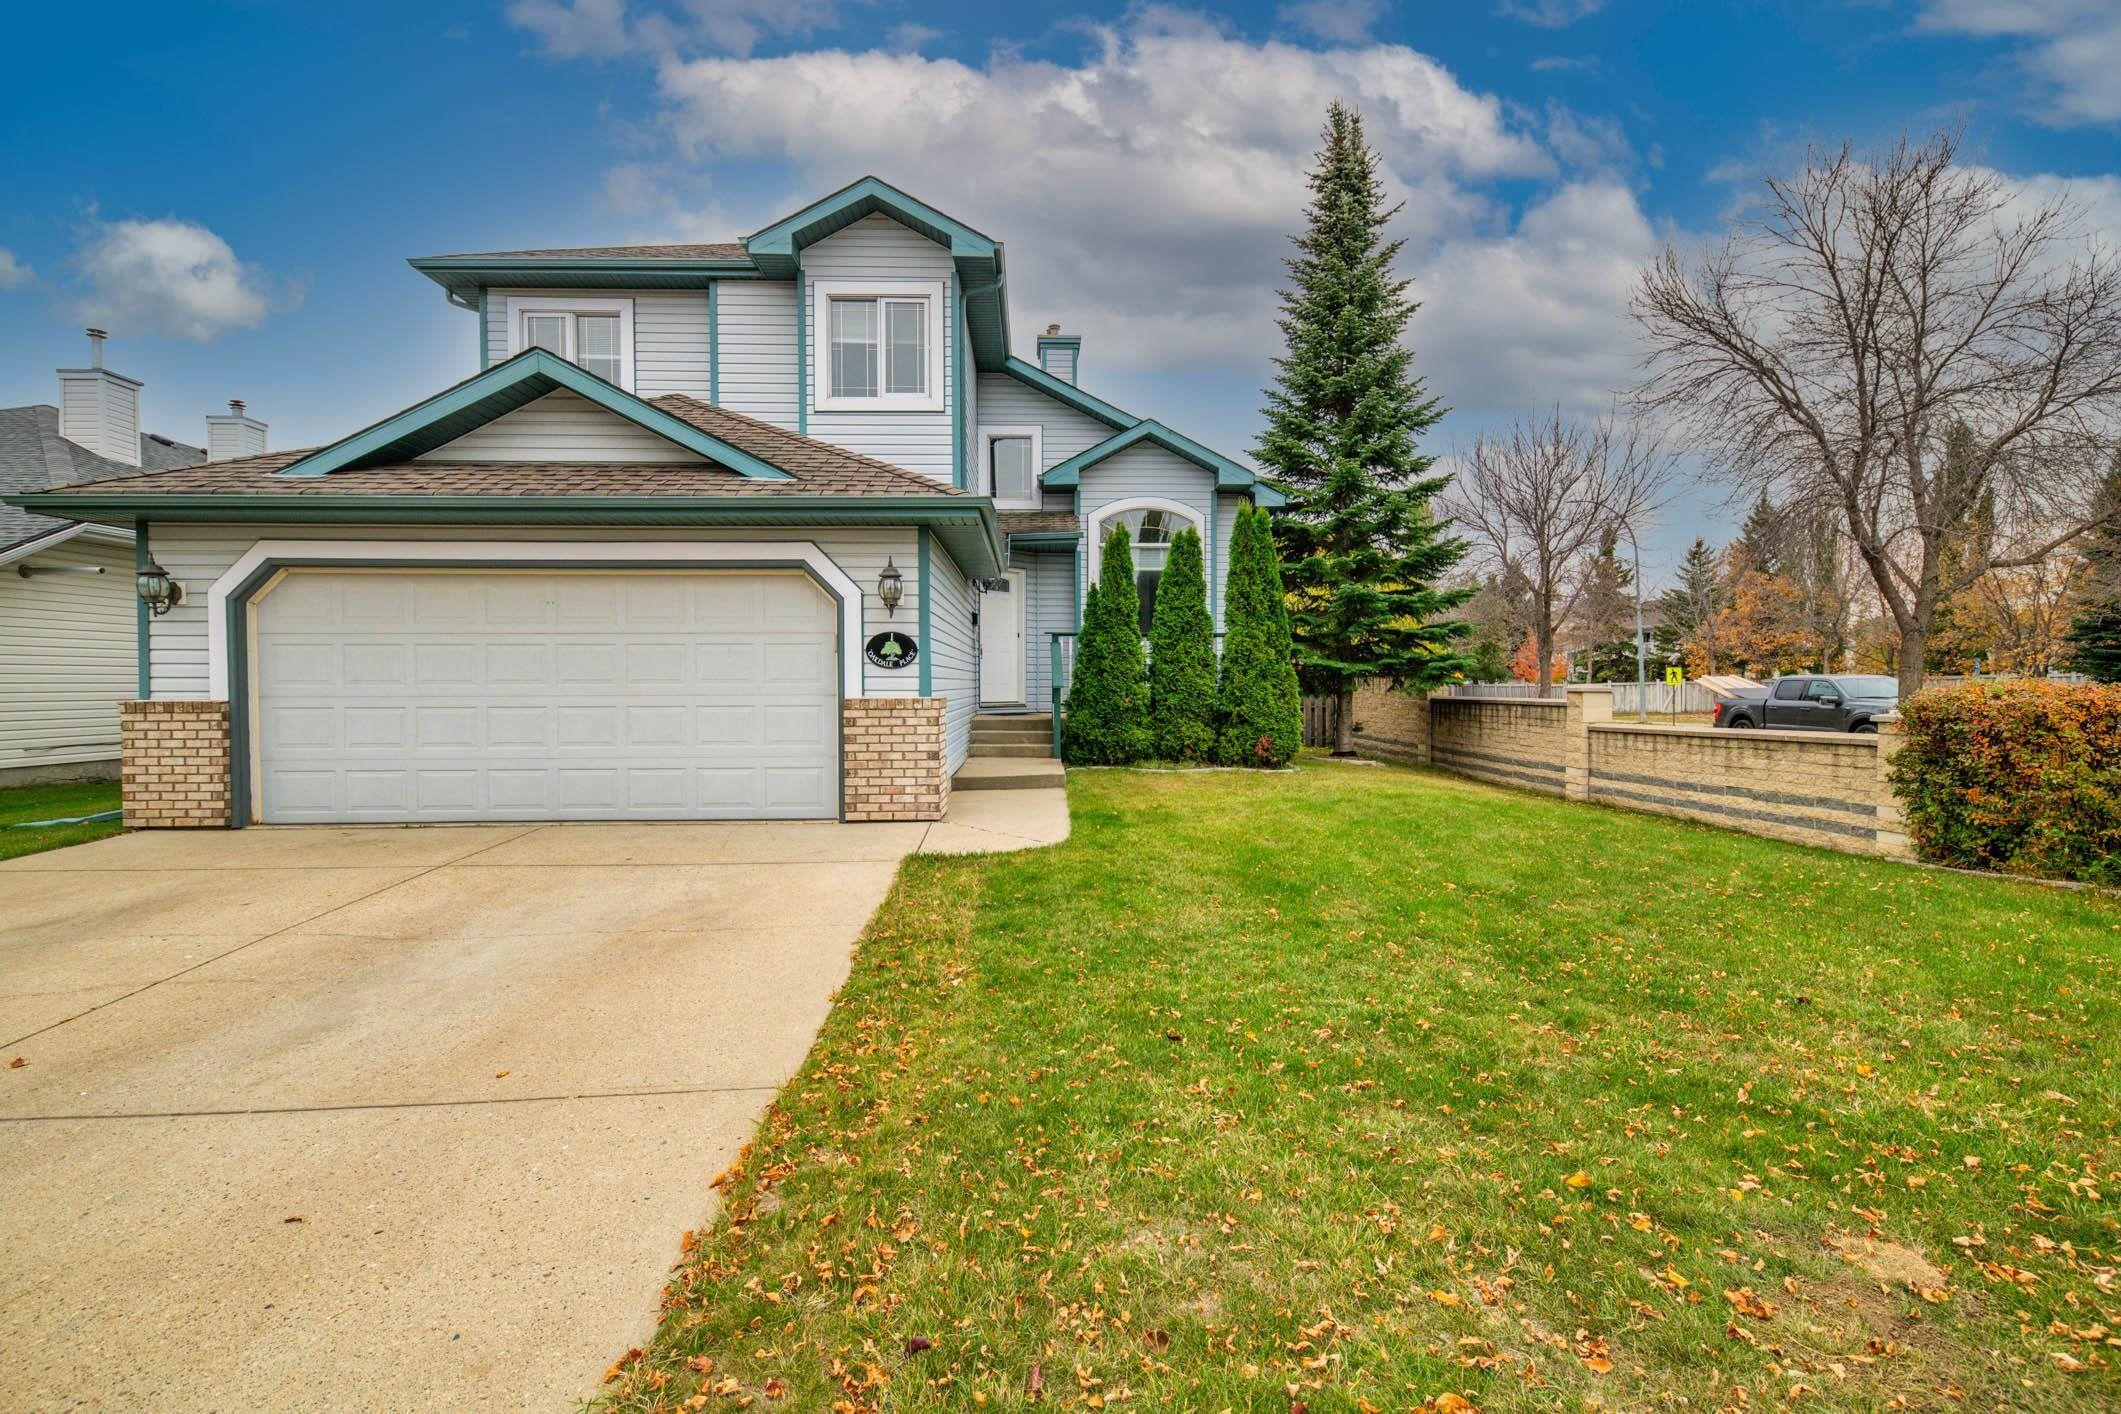 Main Photo: 1 Oakdale Place: St. Albert House for sale : MLS®# E4264071